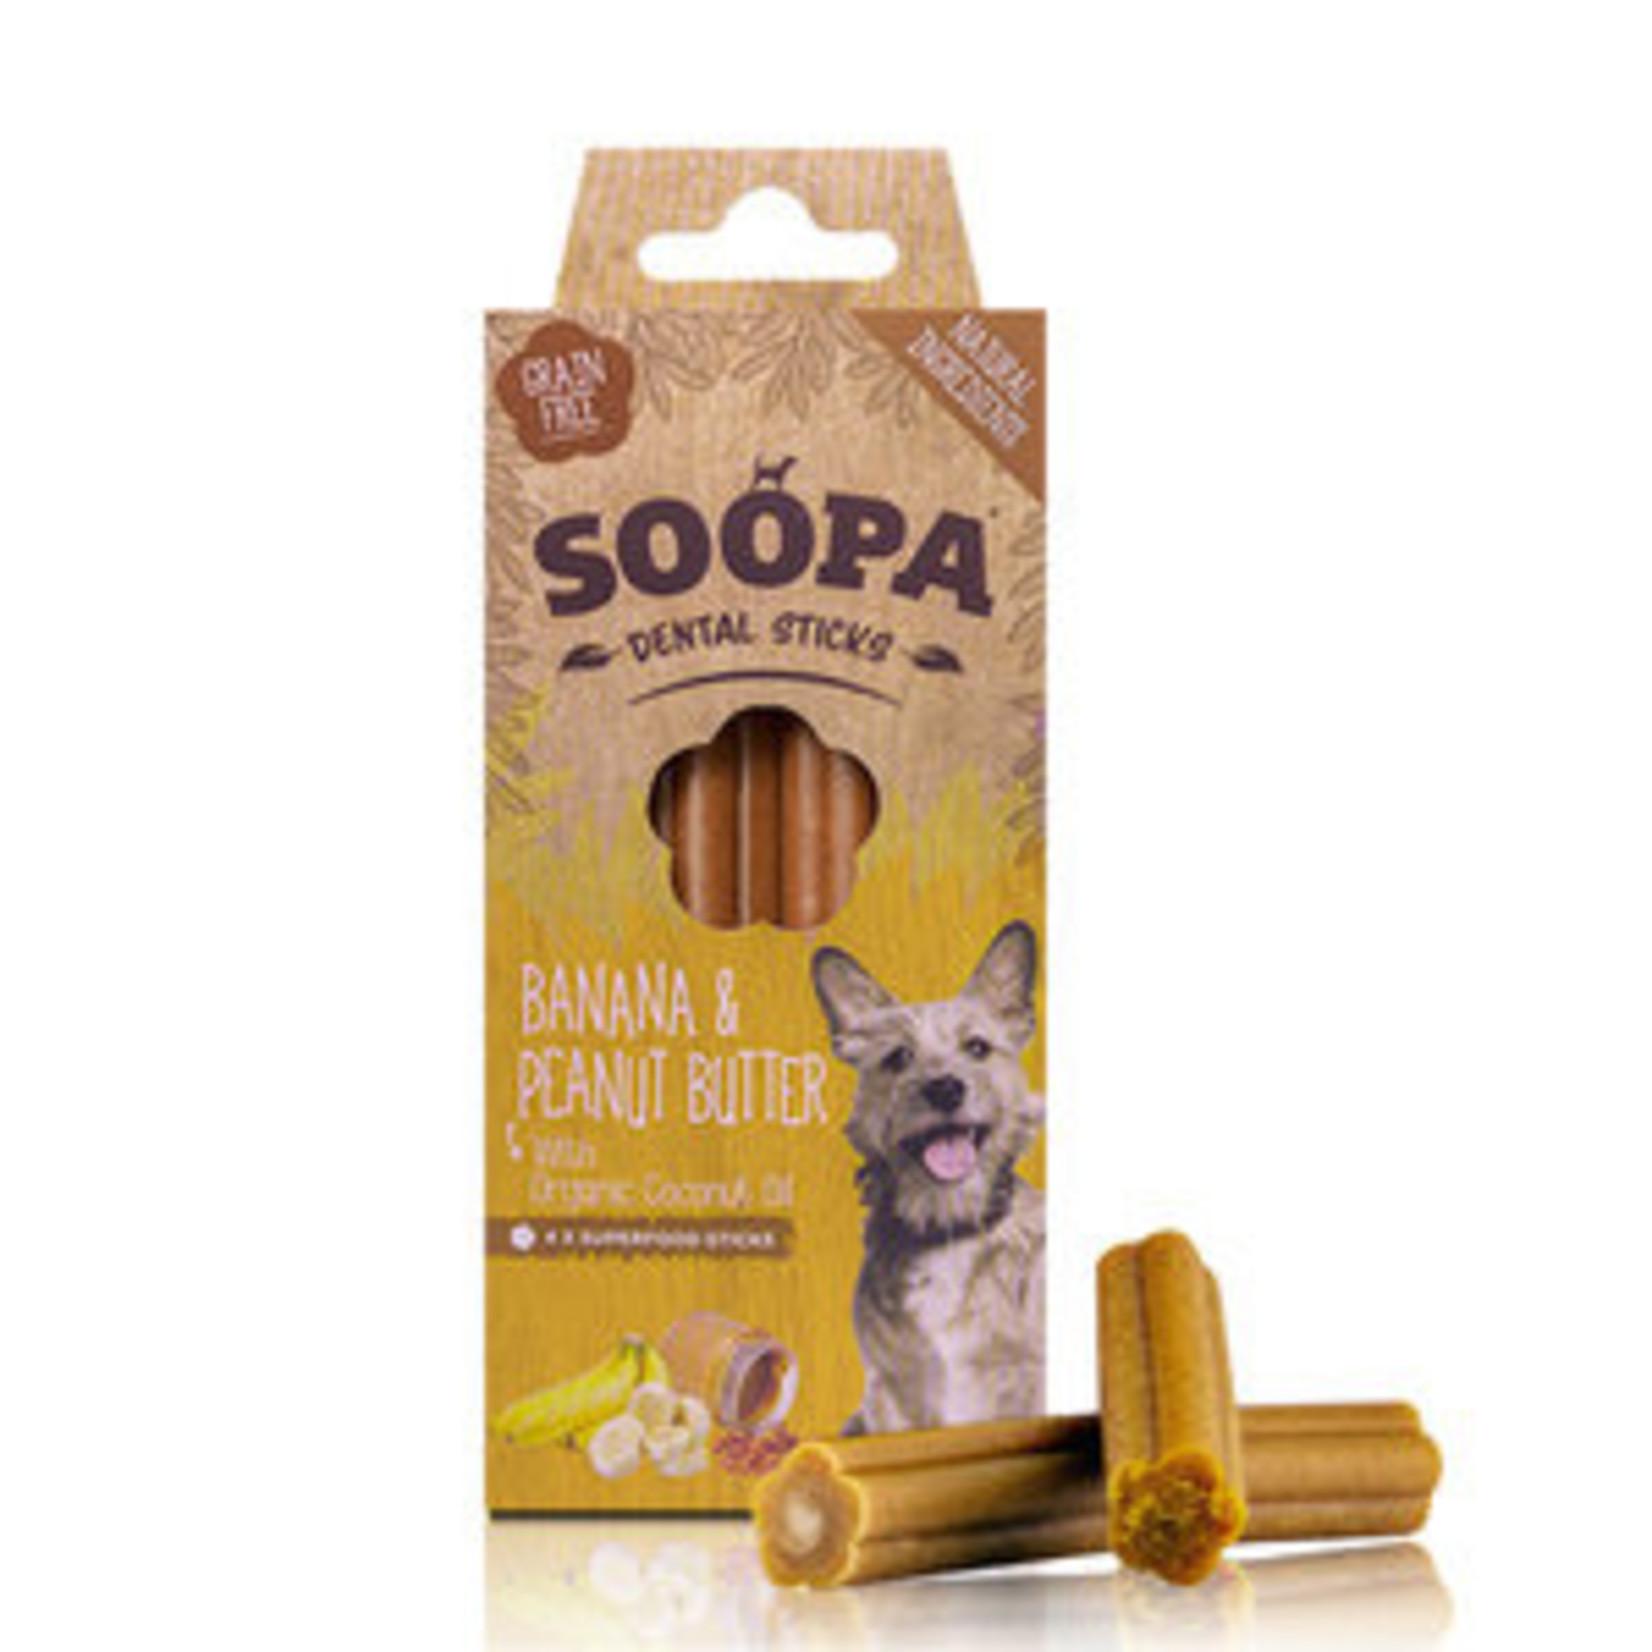 Soopa Dental Sticks